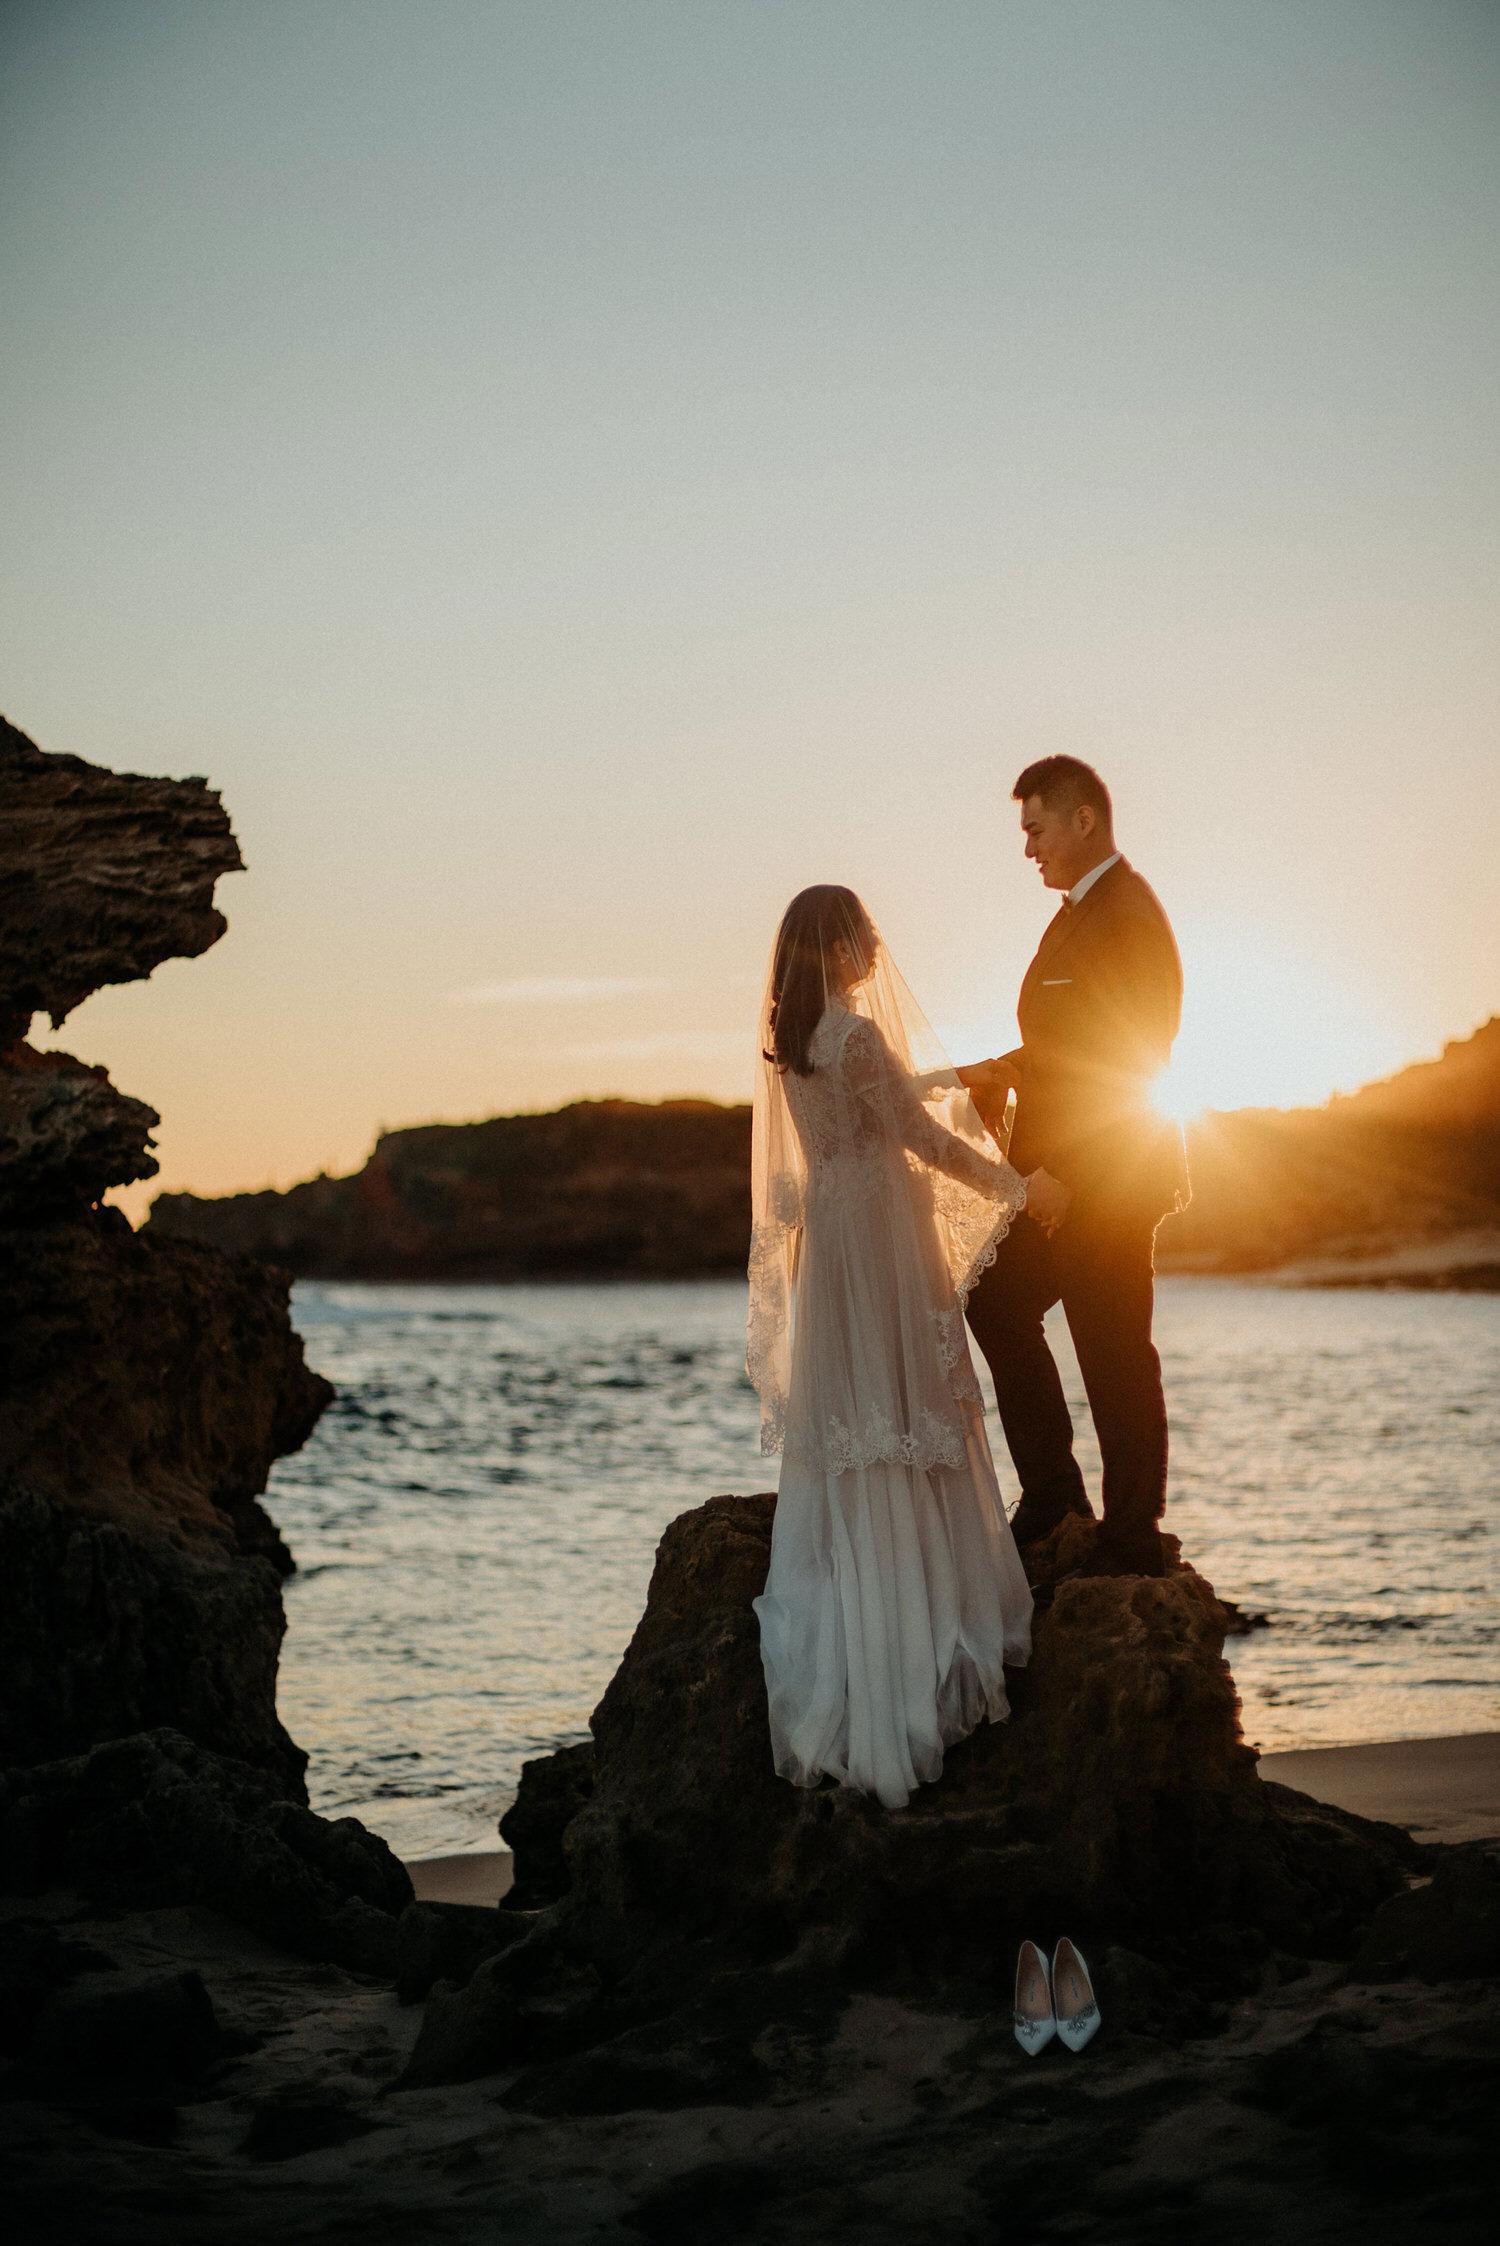 049-melbourne-wedding-bride-and-groom-andrew-hardy-sunset-sorrento.jpg